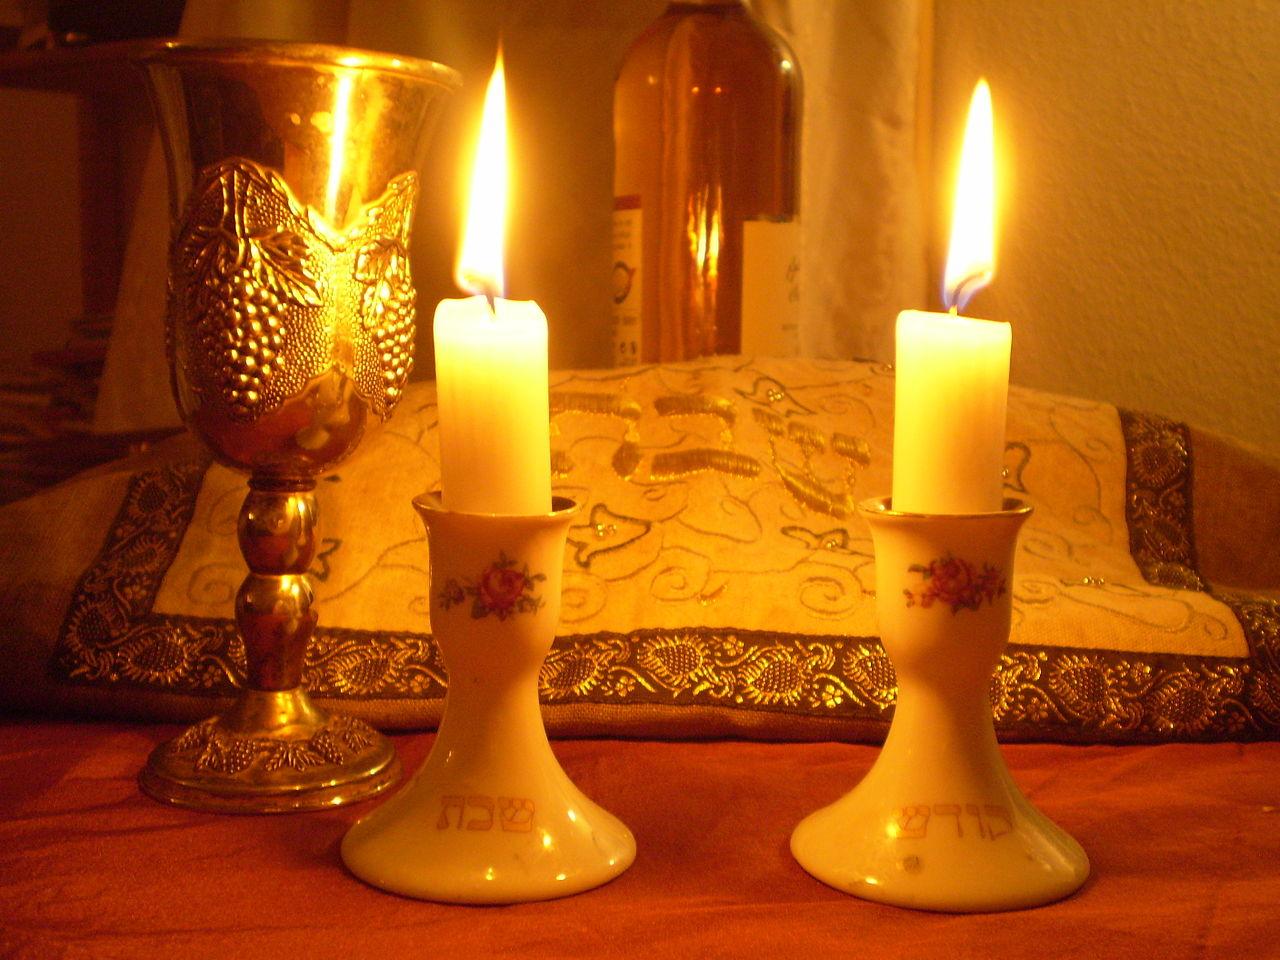 Shabbat dinner candles